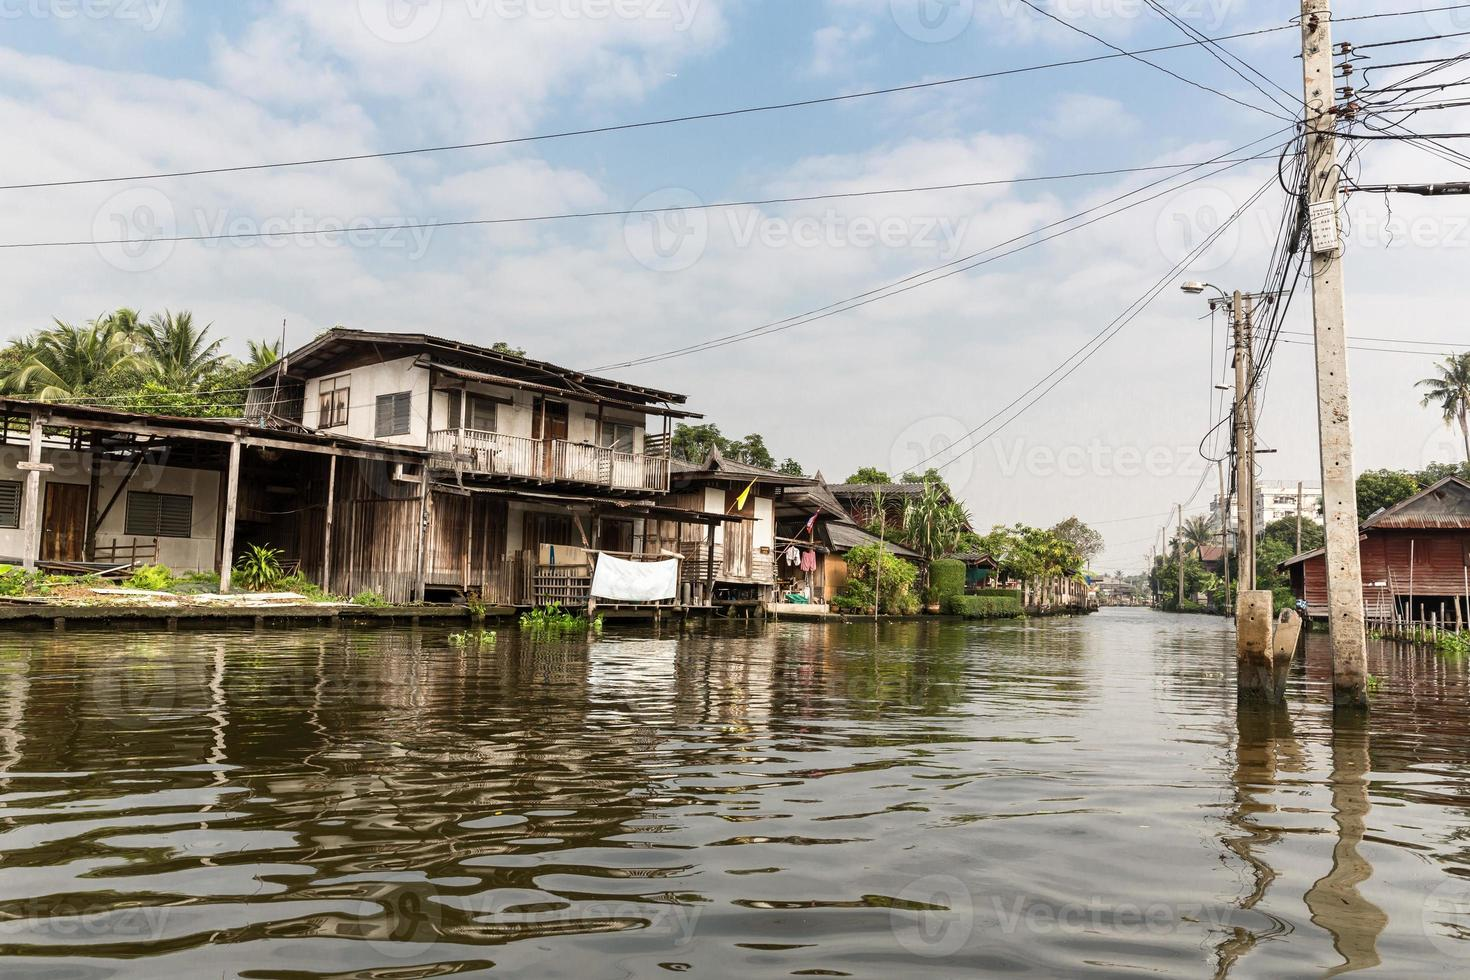 favela em canal sujo na tailândia foto